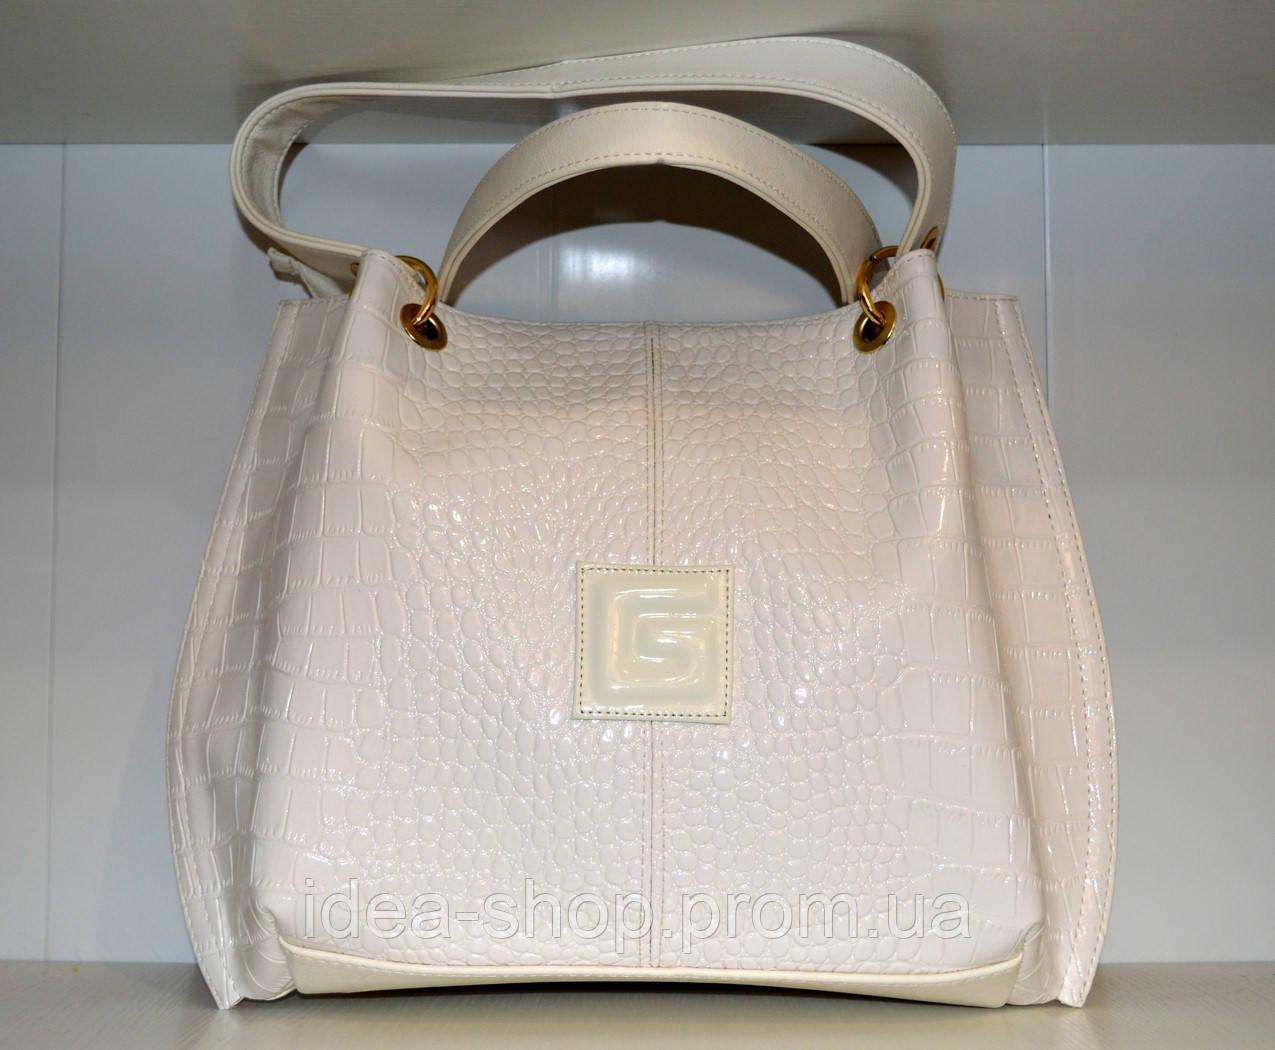 385292ae1ec9 Сумка-торба женская белая, сумка жіноча біла, цена 535 грн., купить ...